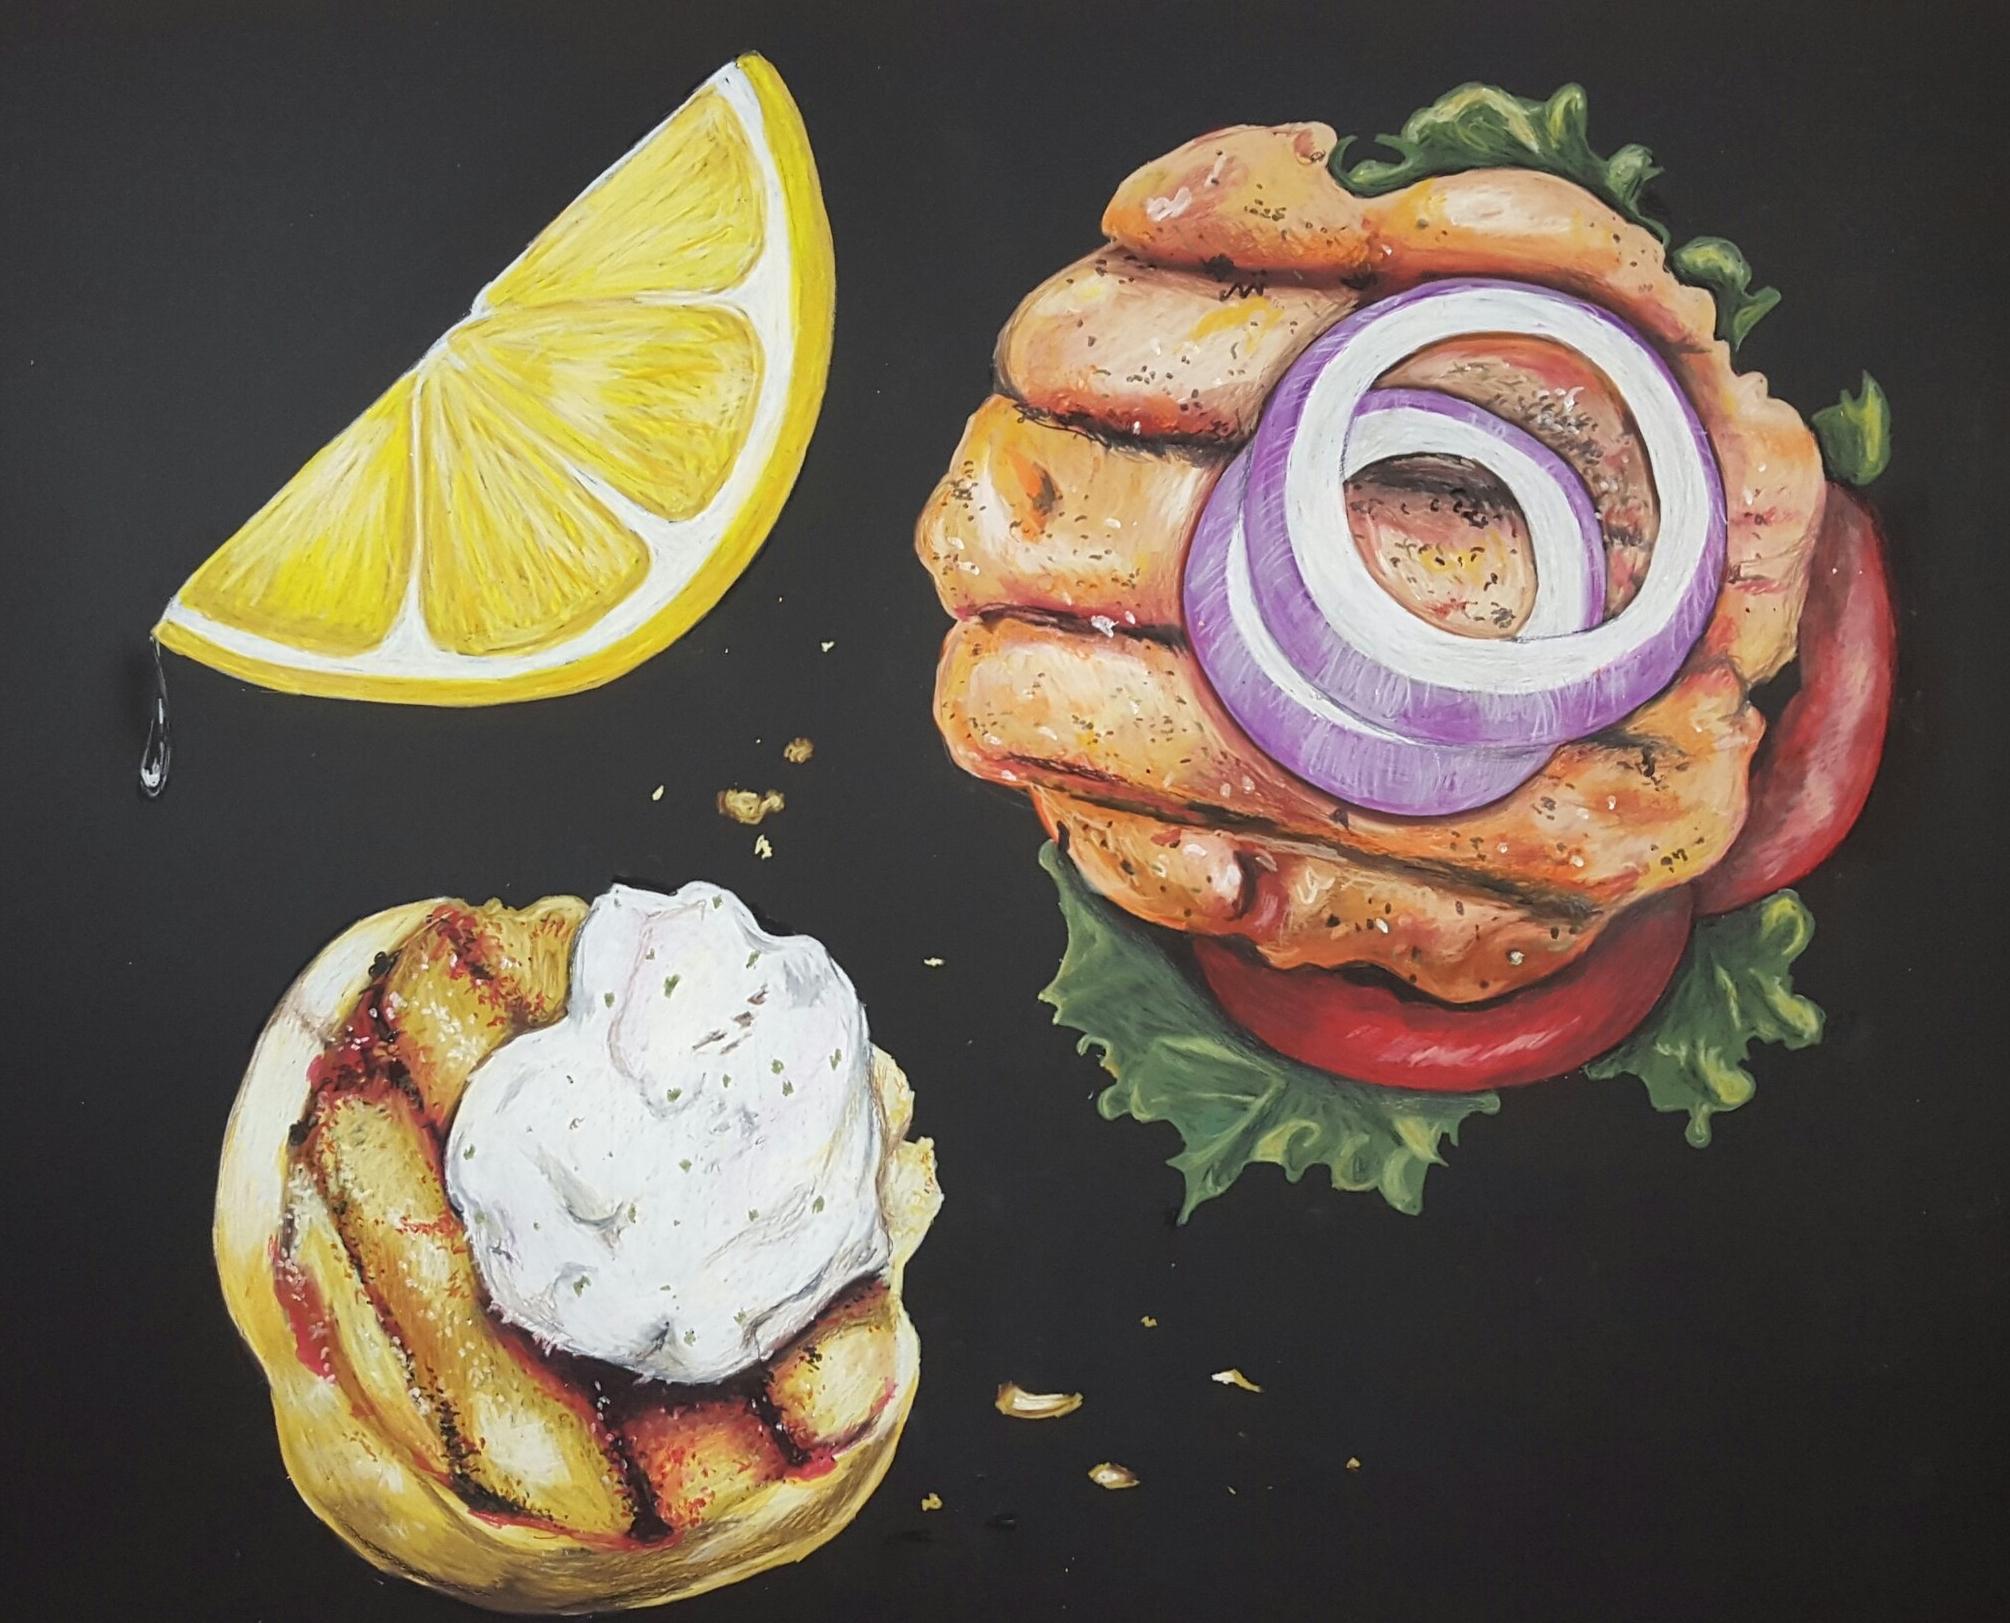 Neocolor ii Salmon Burger